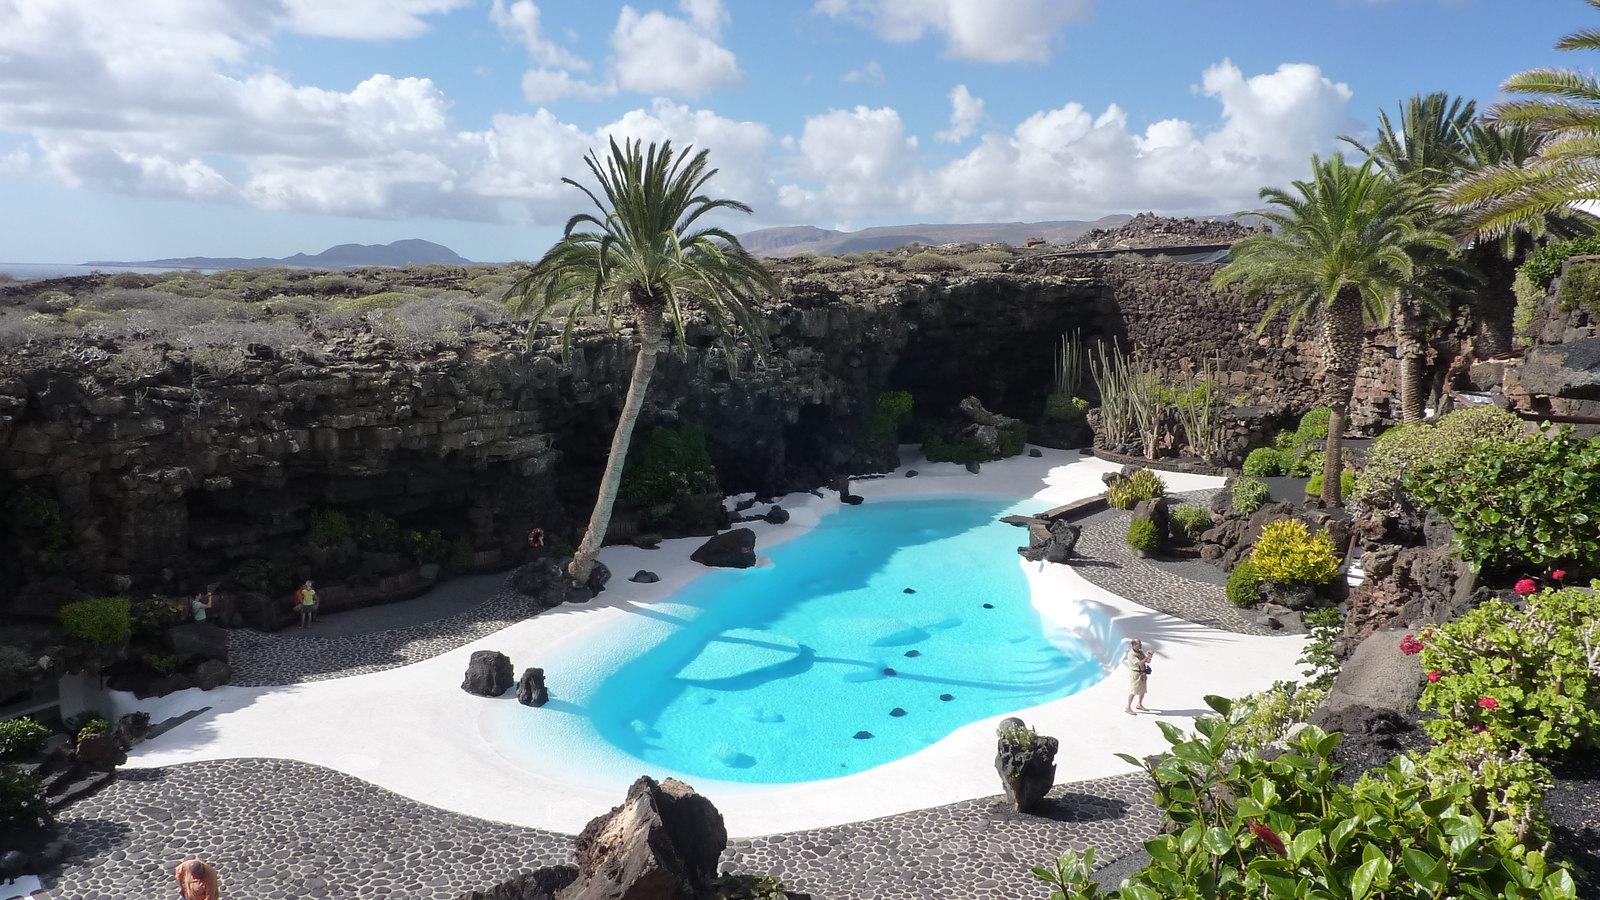 La piscina de los jameos del agua flickr photo sharing for Agua piscina